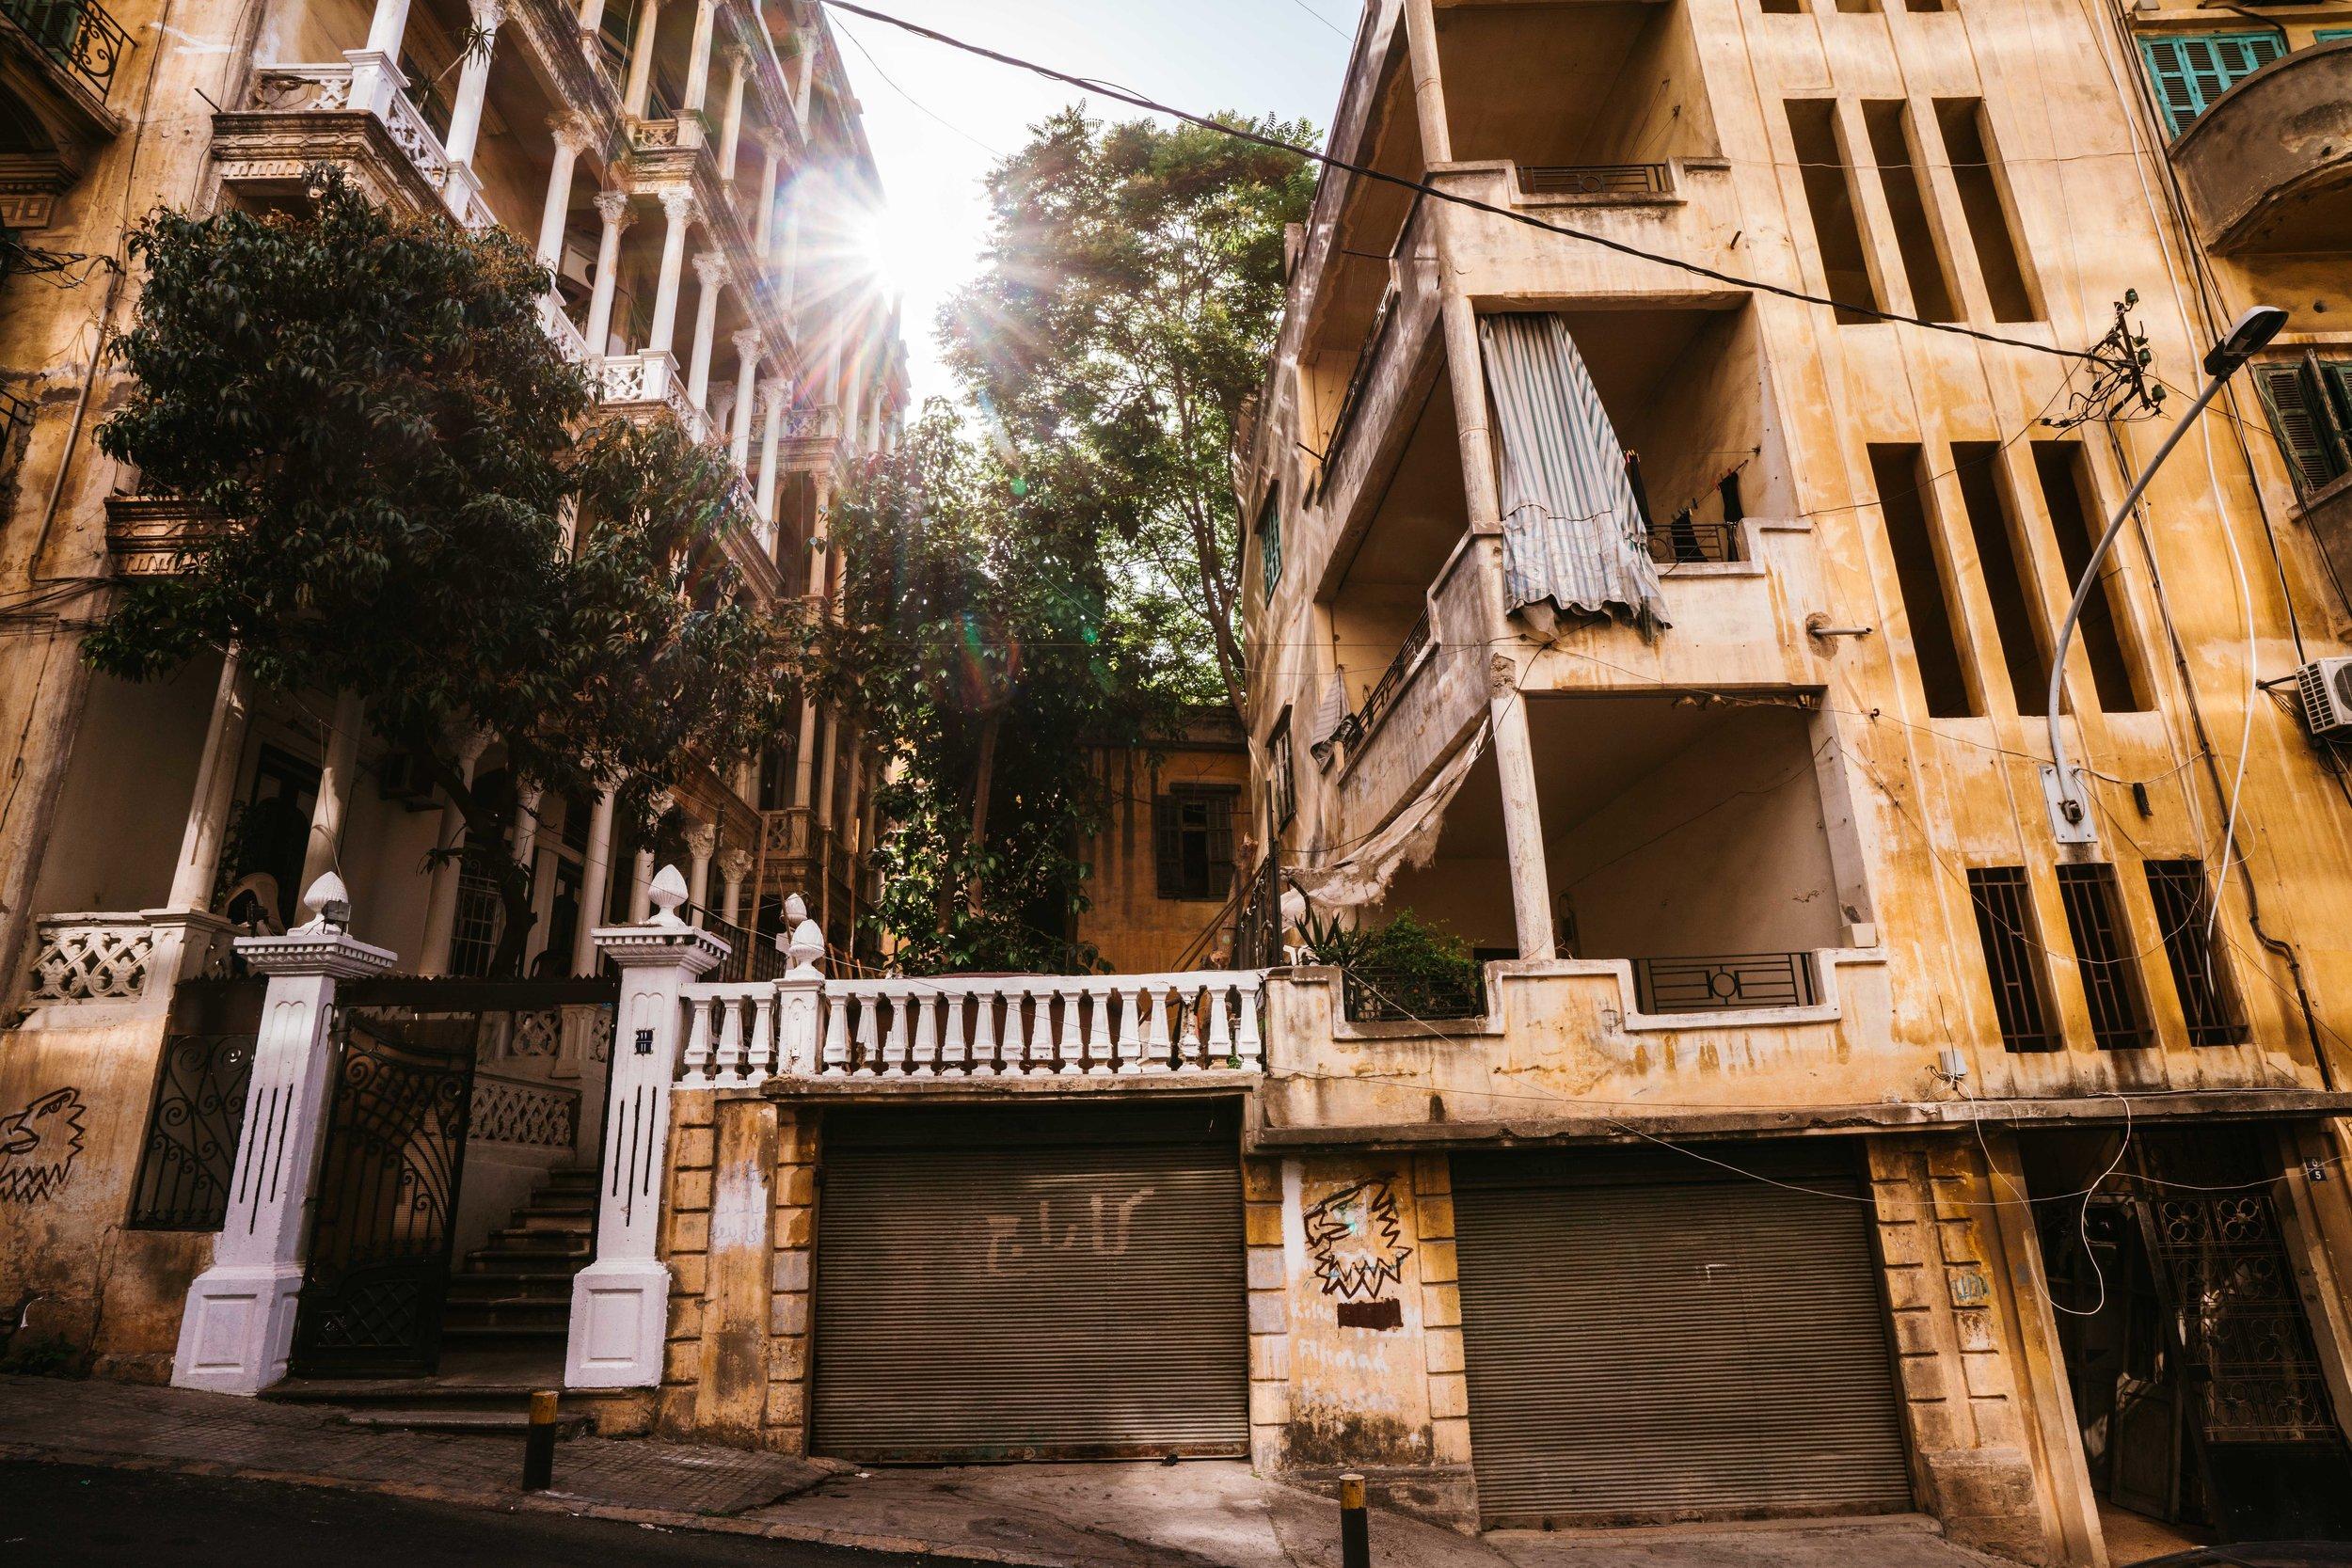 Lebanon visit-6.jpg